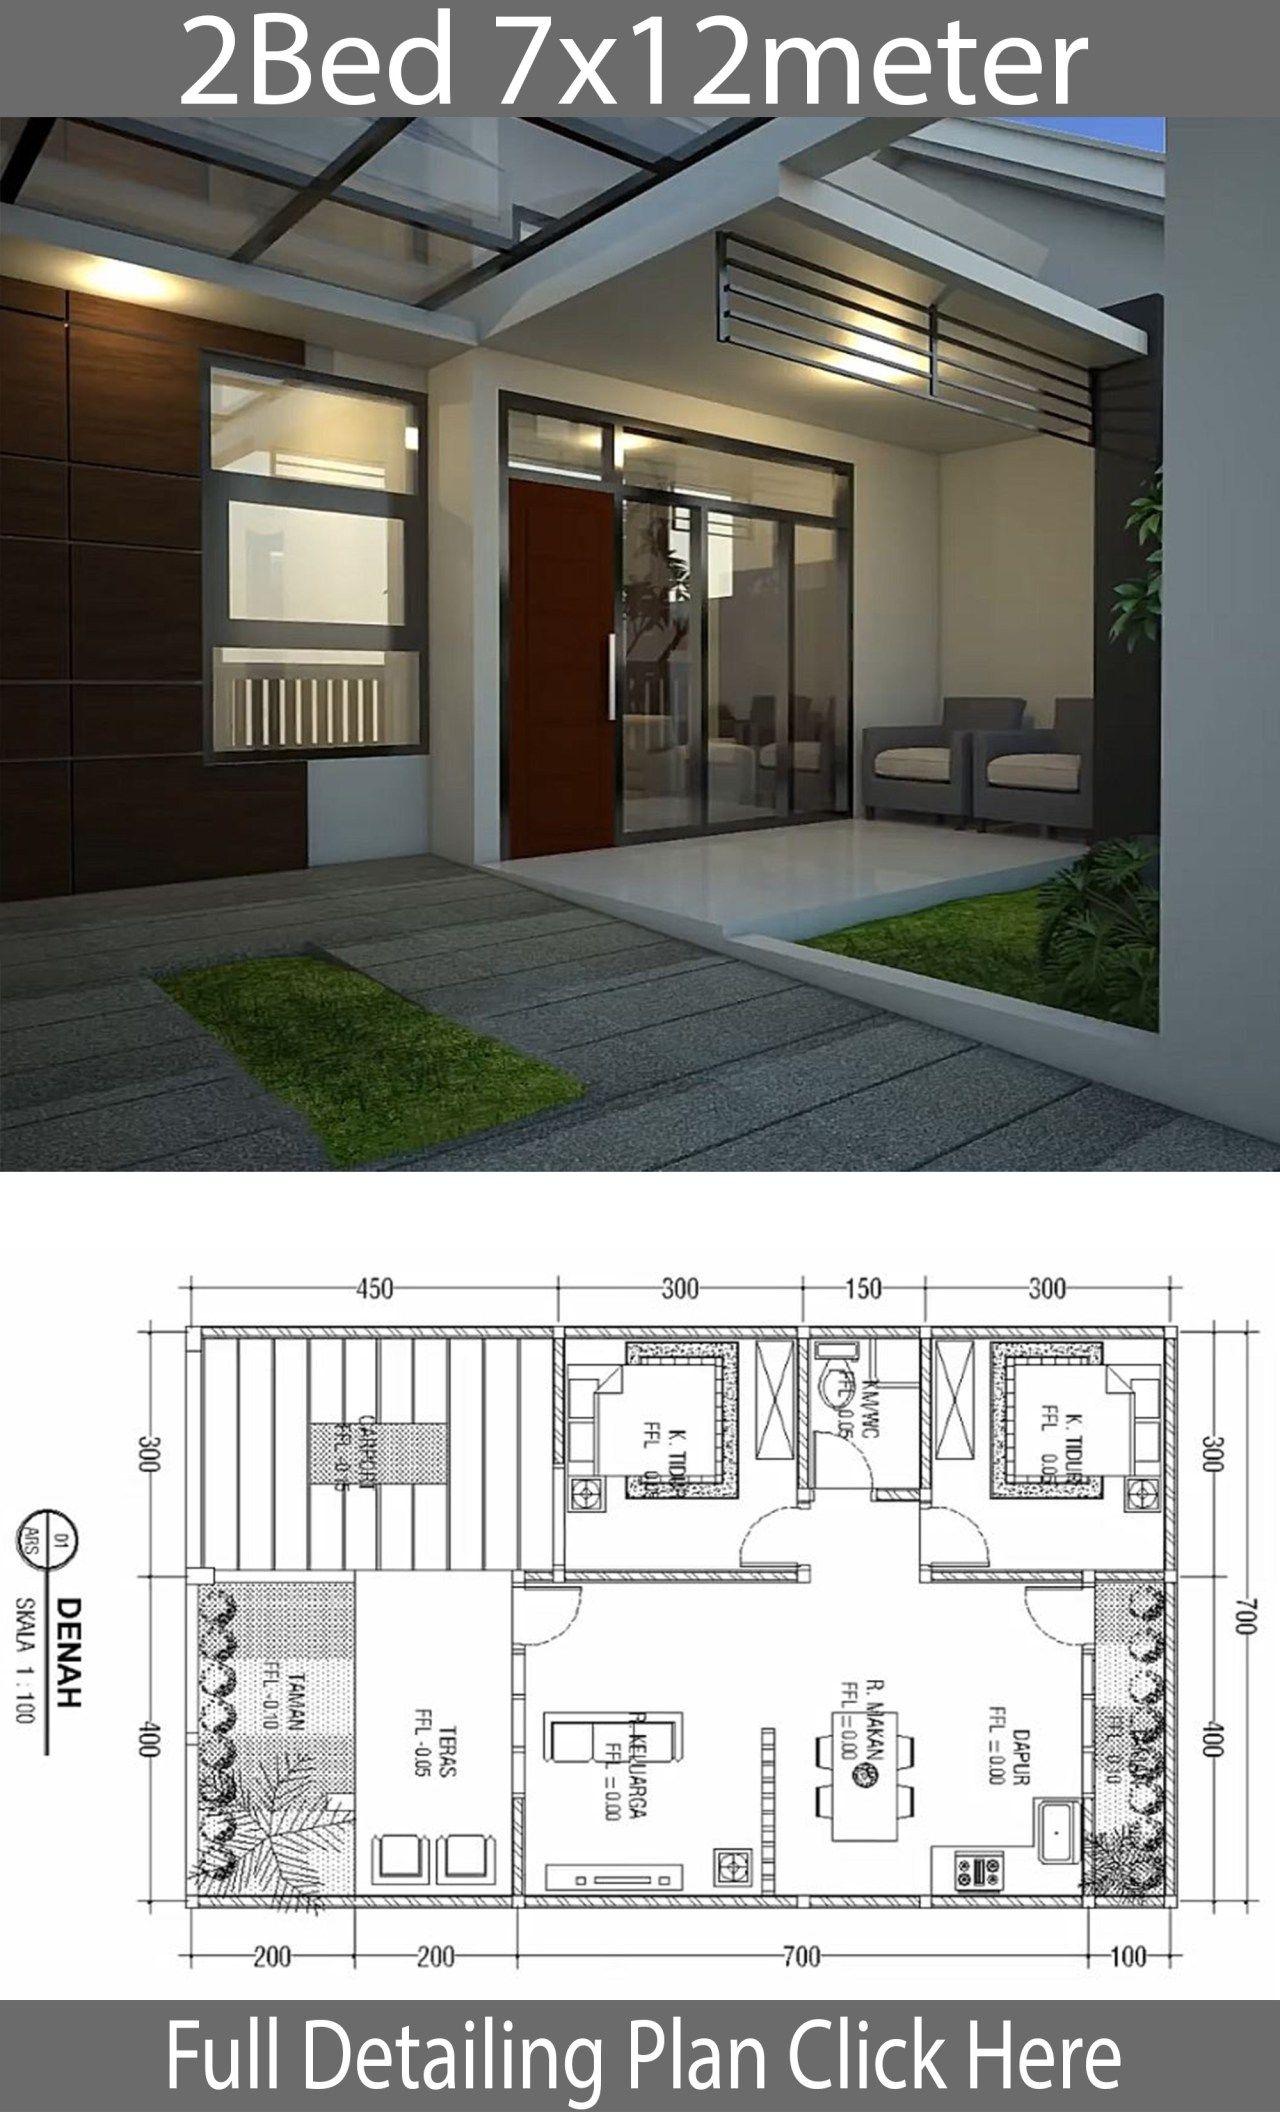 Minimalist Floor Design One Floor House 7x12m Home Ideas Village House Design Craftsman House Designs Minimalist House Design